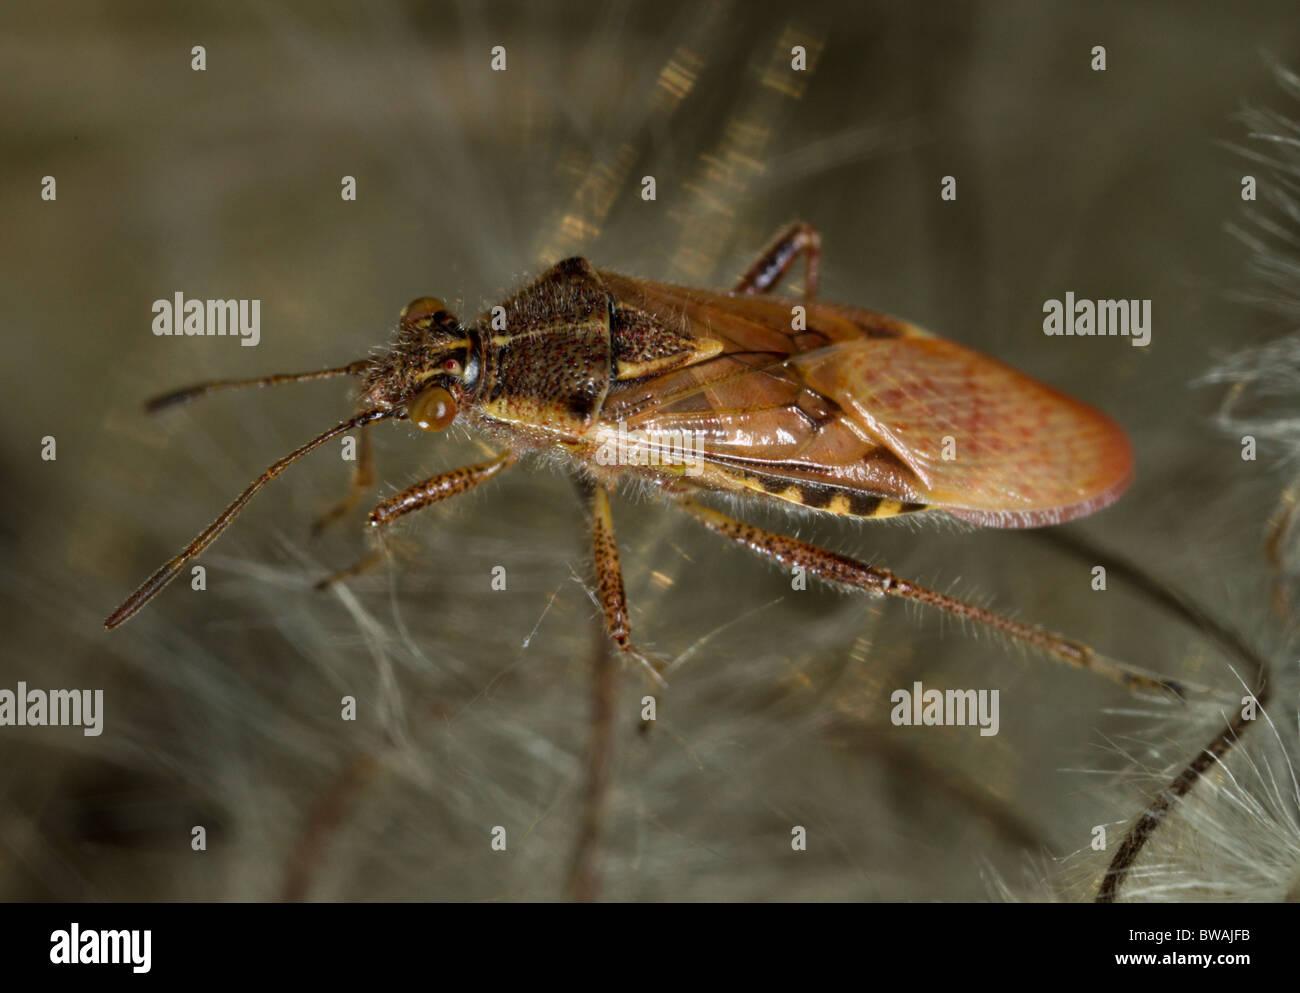 Capsid or mirid bug - Stock Image